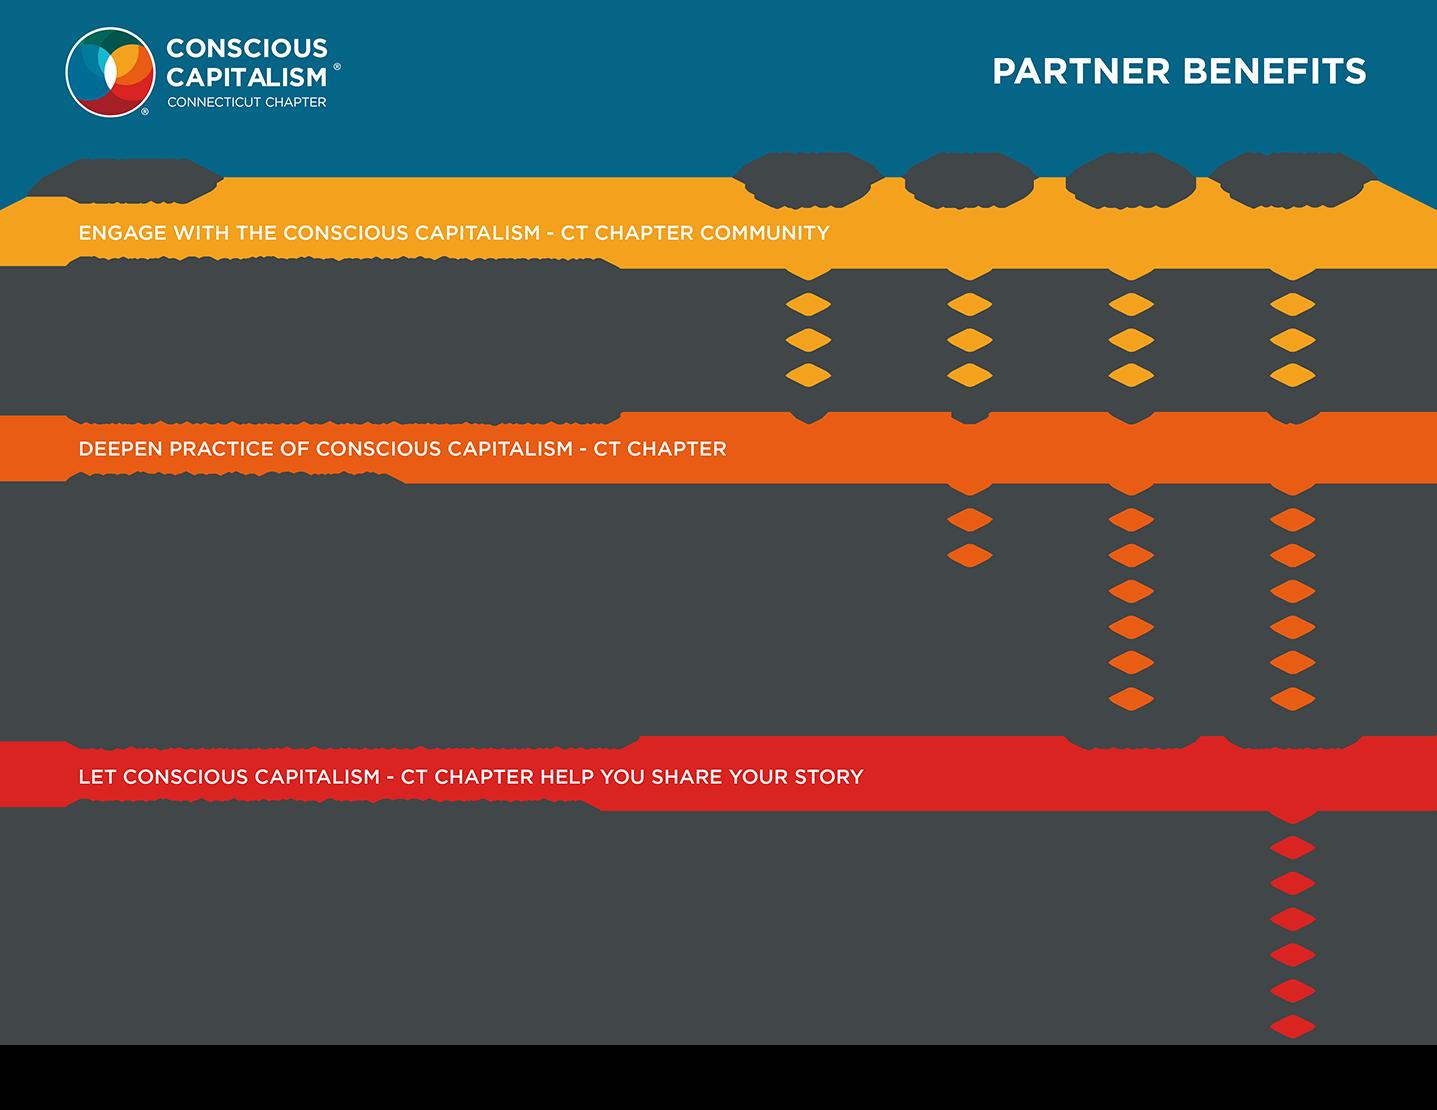 conscious-capitalism-connecituct-chapter-partner-benefits-sheet